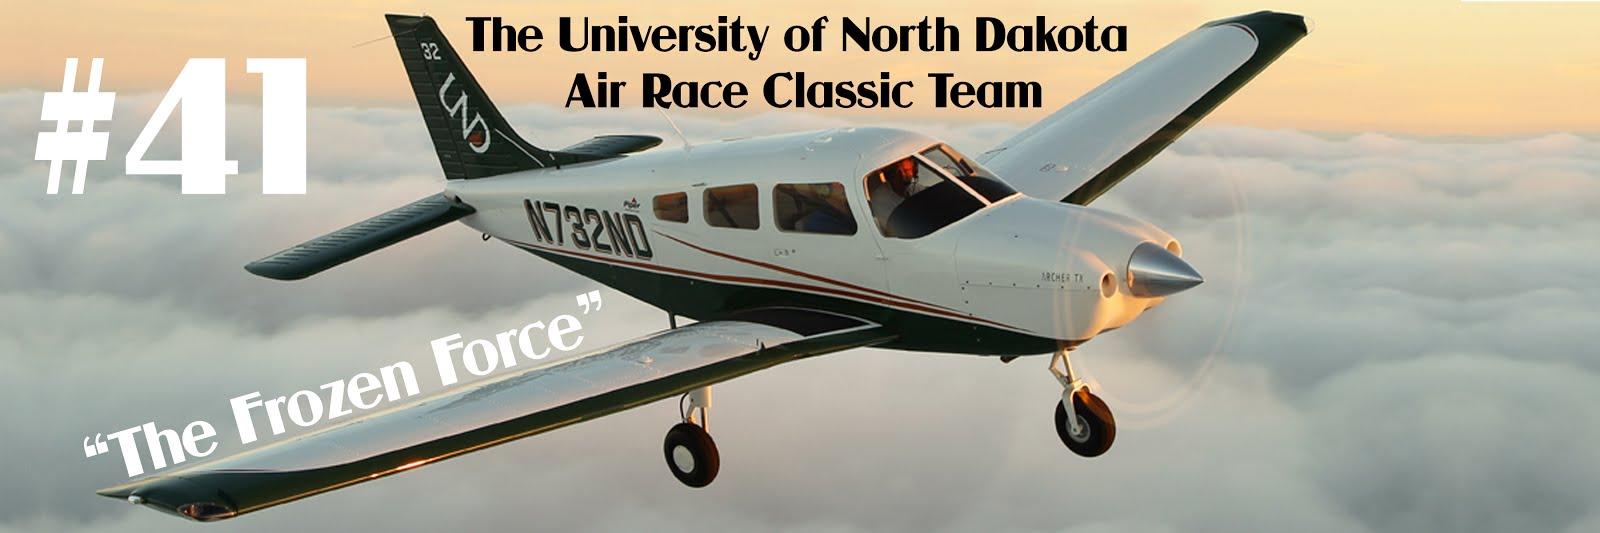 The University of North Dakota Air Race Classic Team